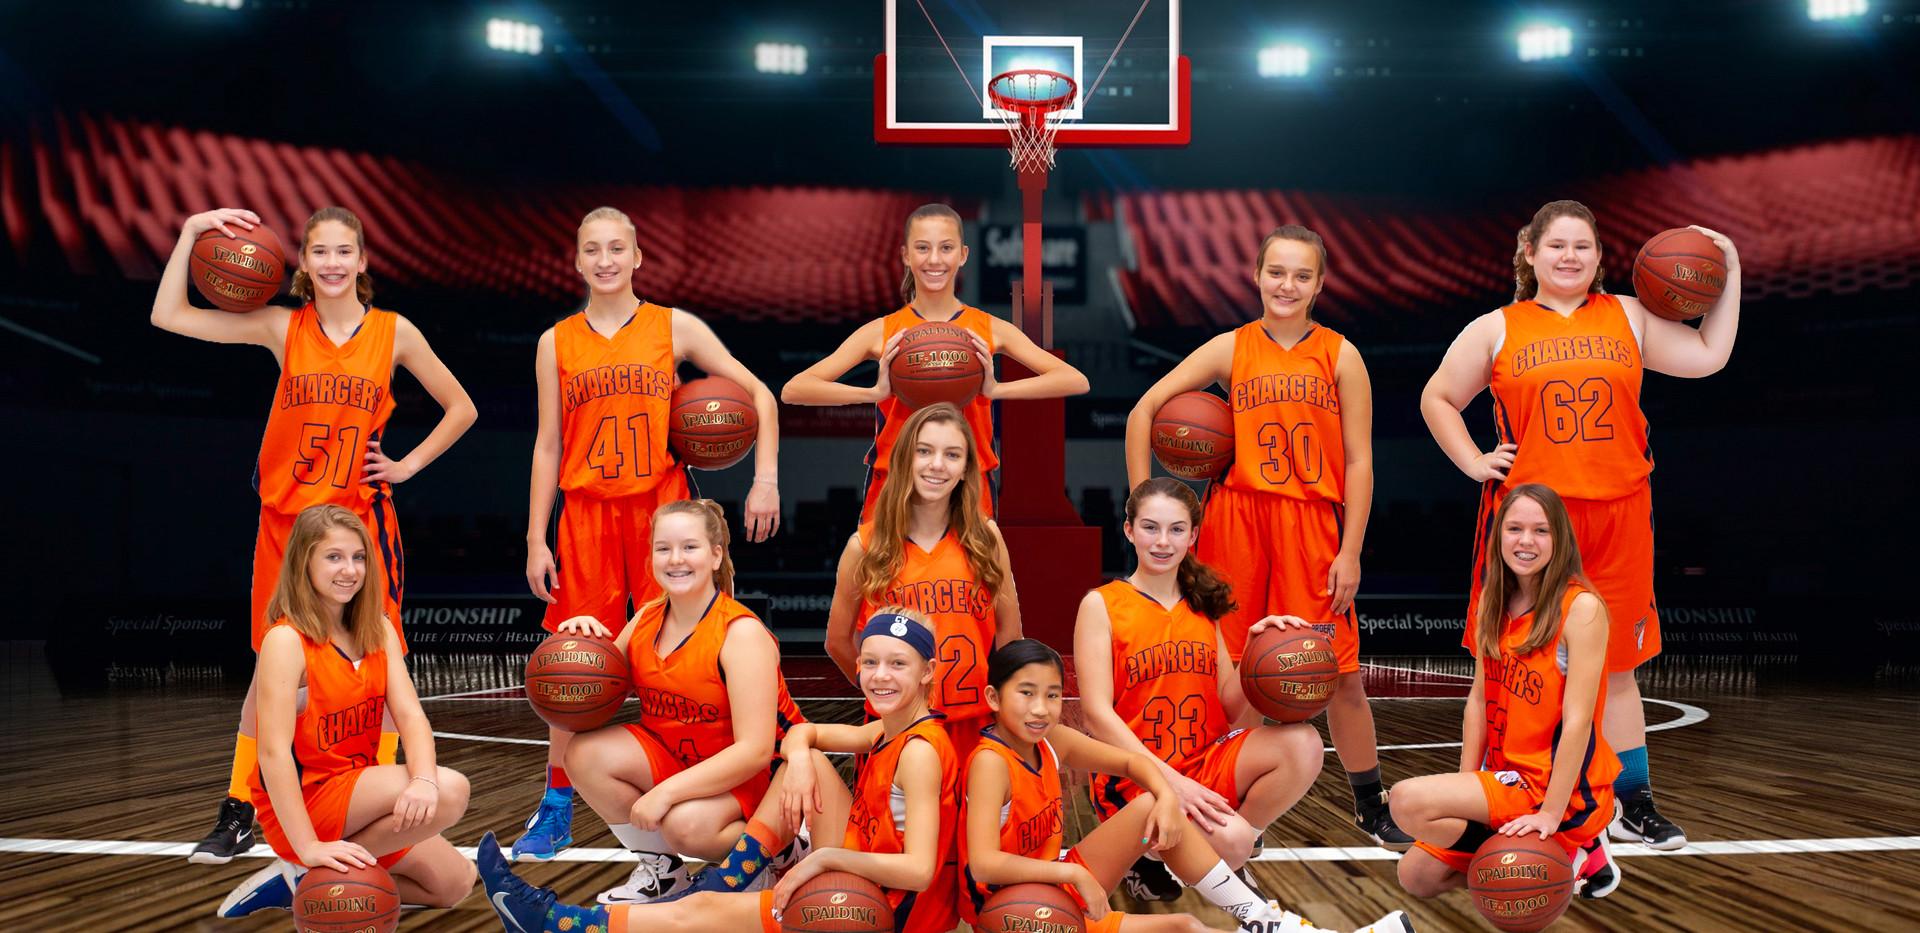 Basketball Champions 2 copy.jpg